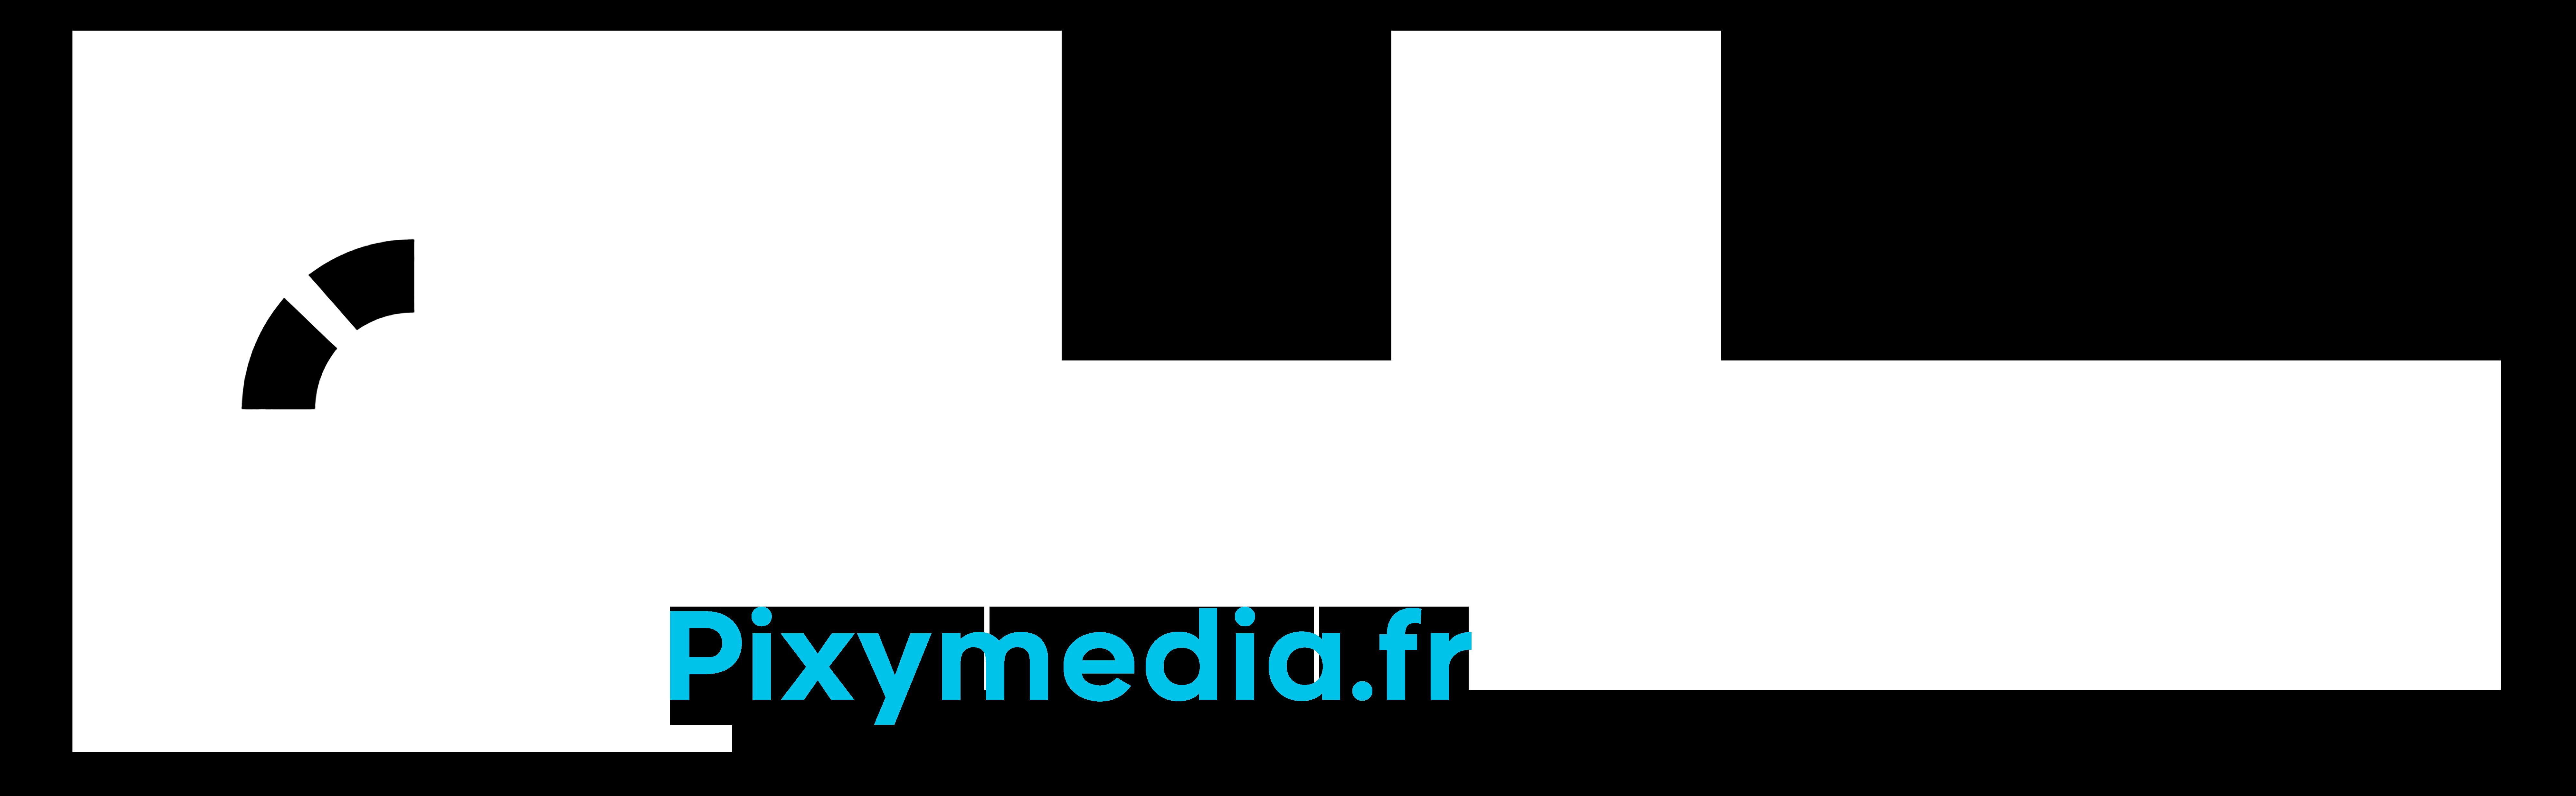 Pixymedia